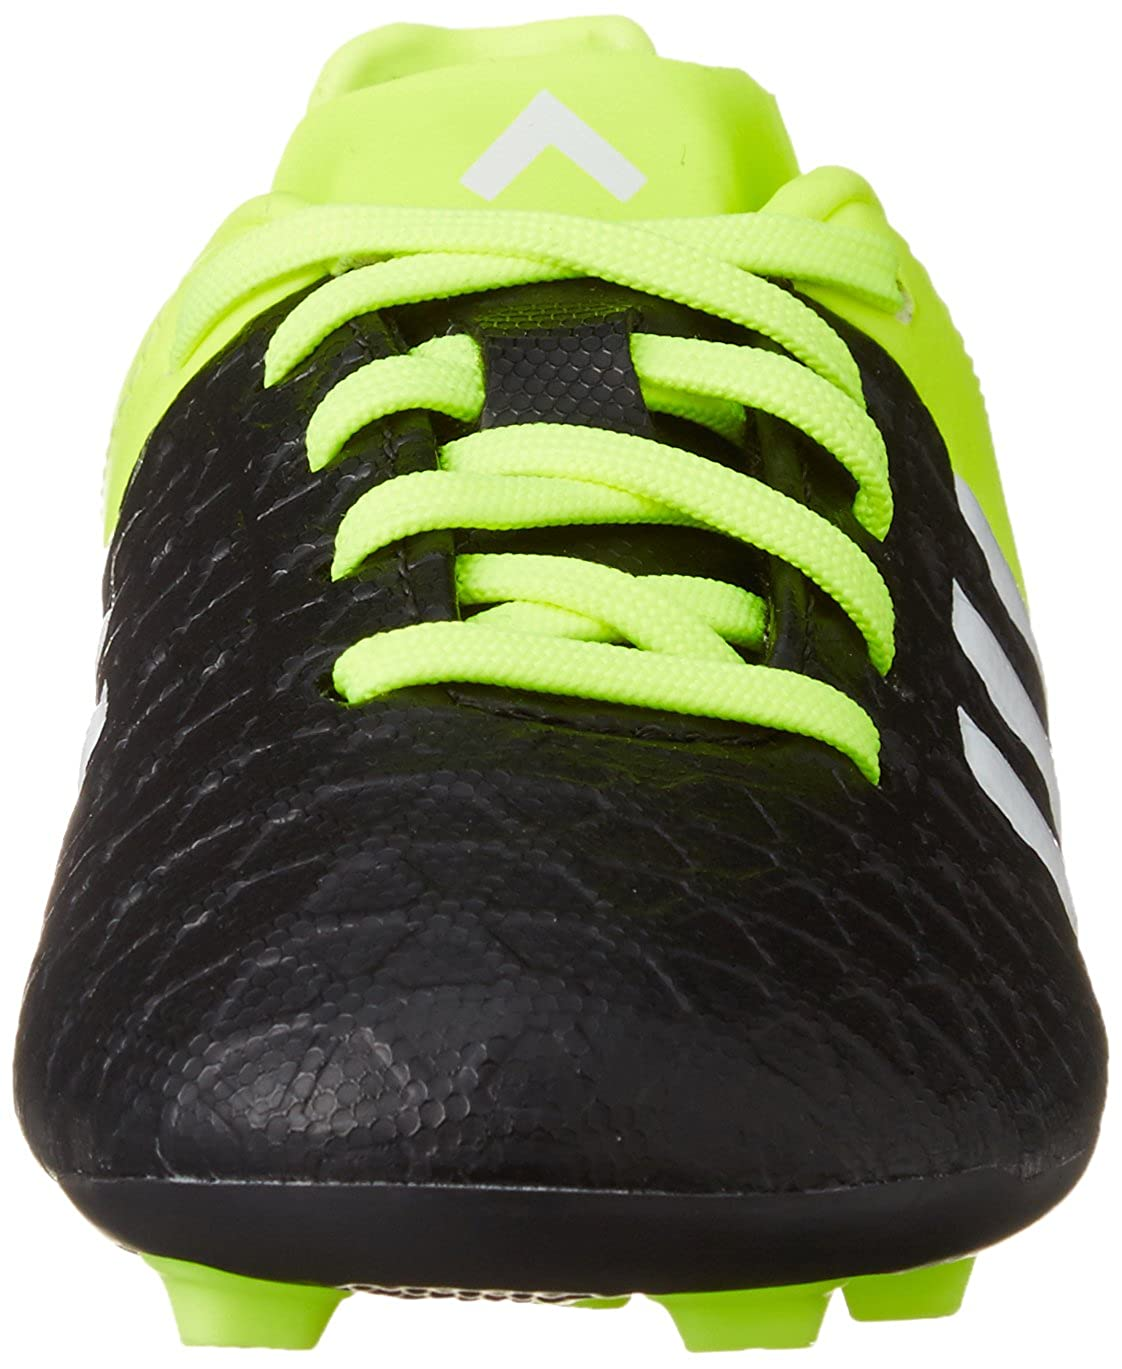 Bambini B32864 Ace15 Da Adidas Calza Scarpe Unisex Cucina 4 Fxg Calcio VSpMGqzU